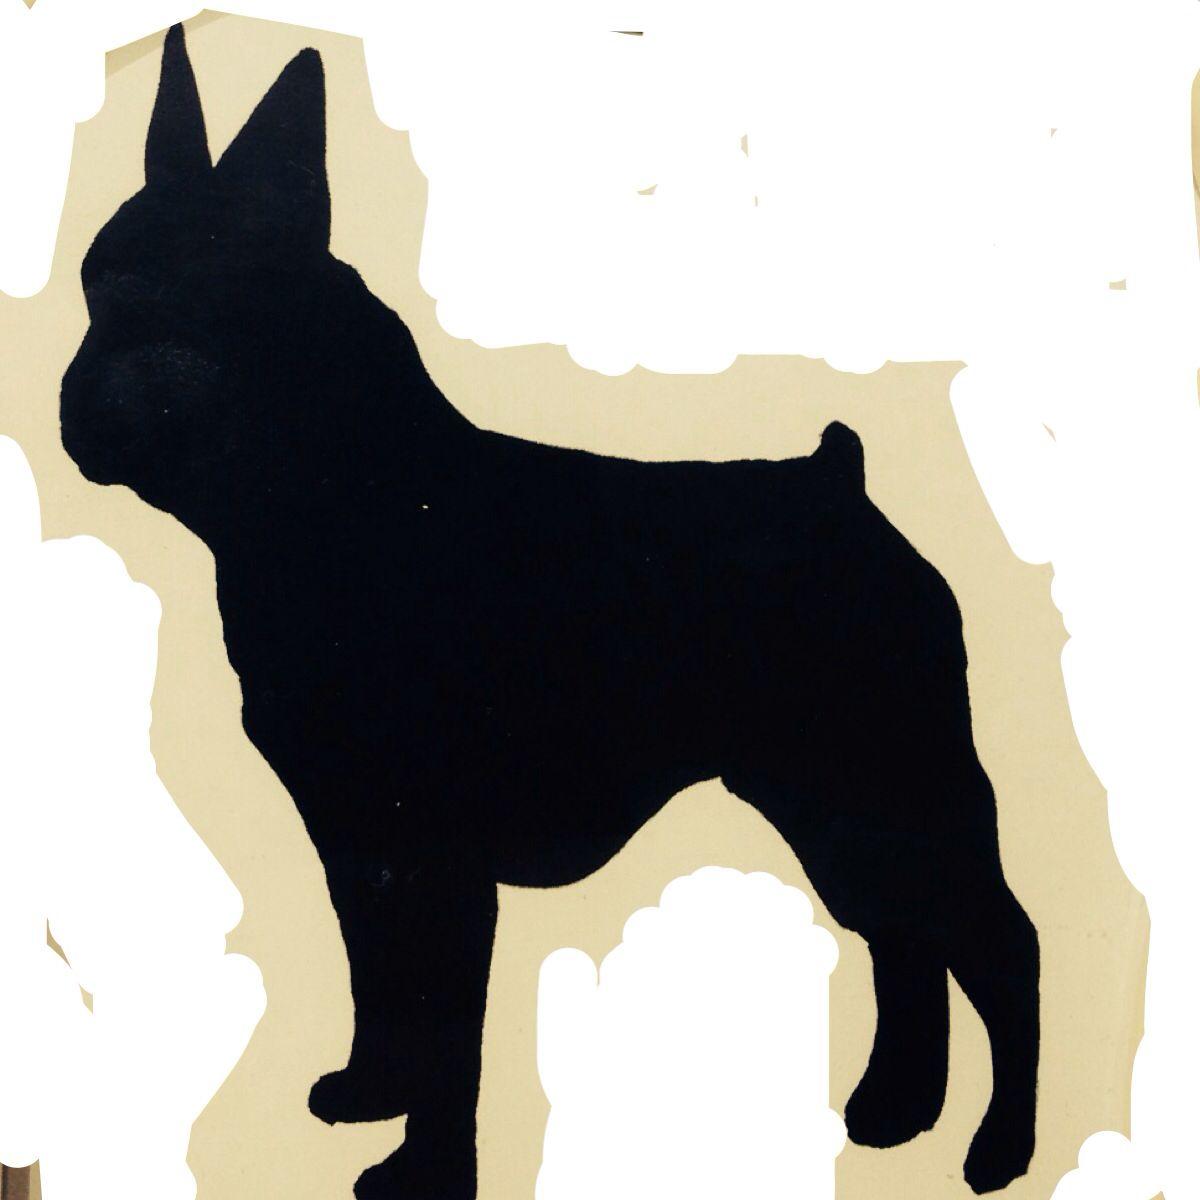 Bulldog Head Silhouette | www.imgkid.com - The Image Kid ...